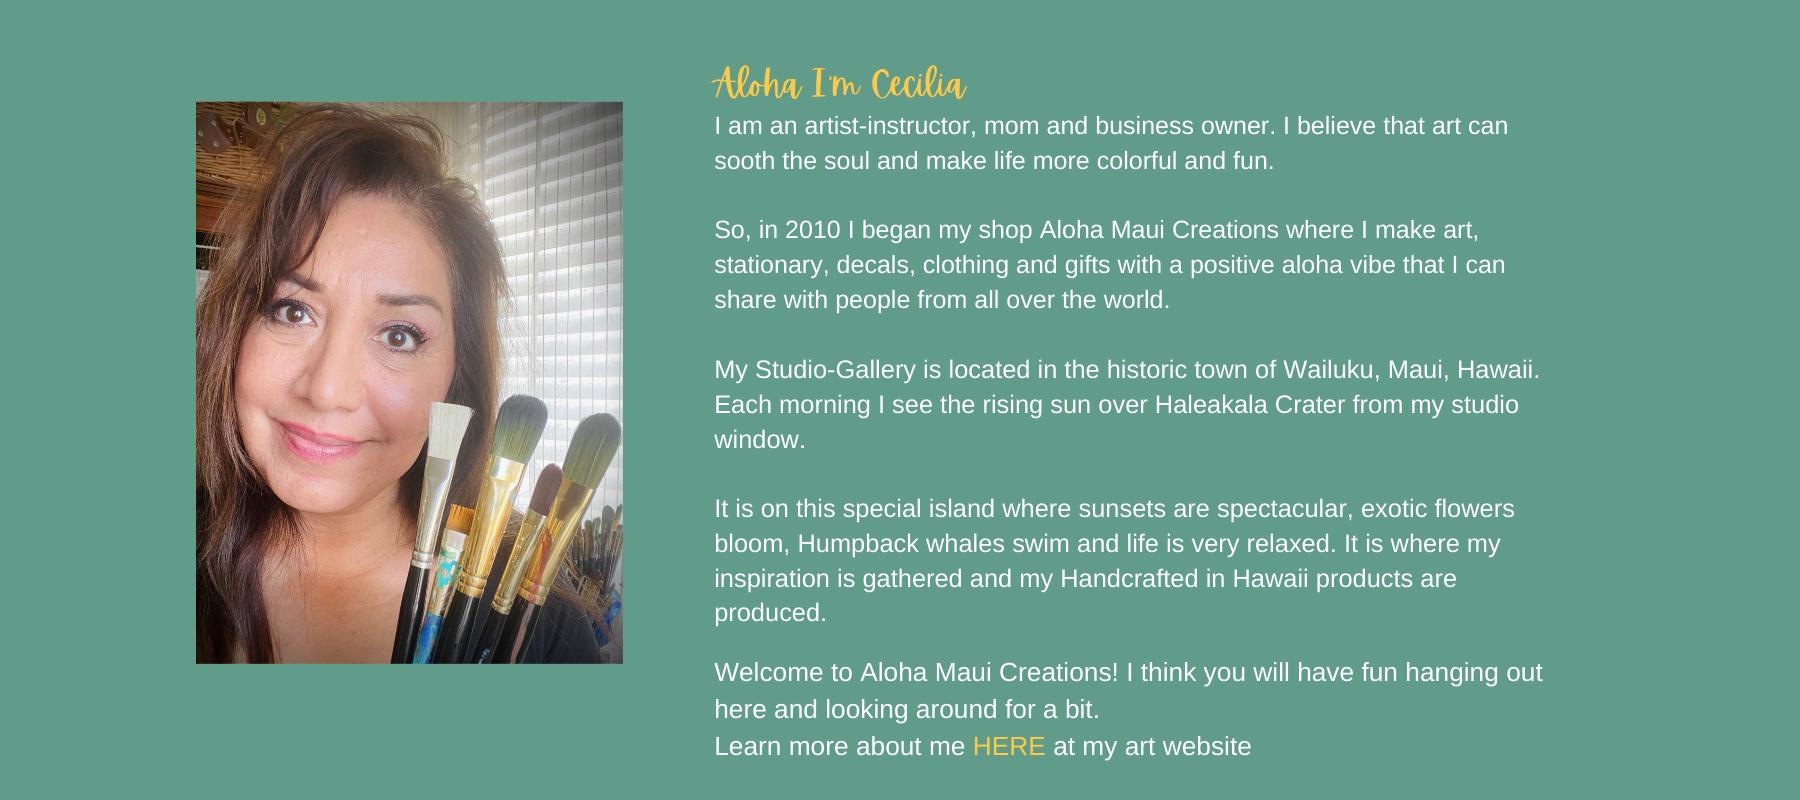 artist Cecilia Chenault, creating positive aloha vibe products, inspirational life, Maui Hawaii